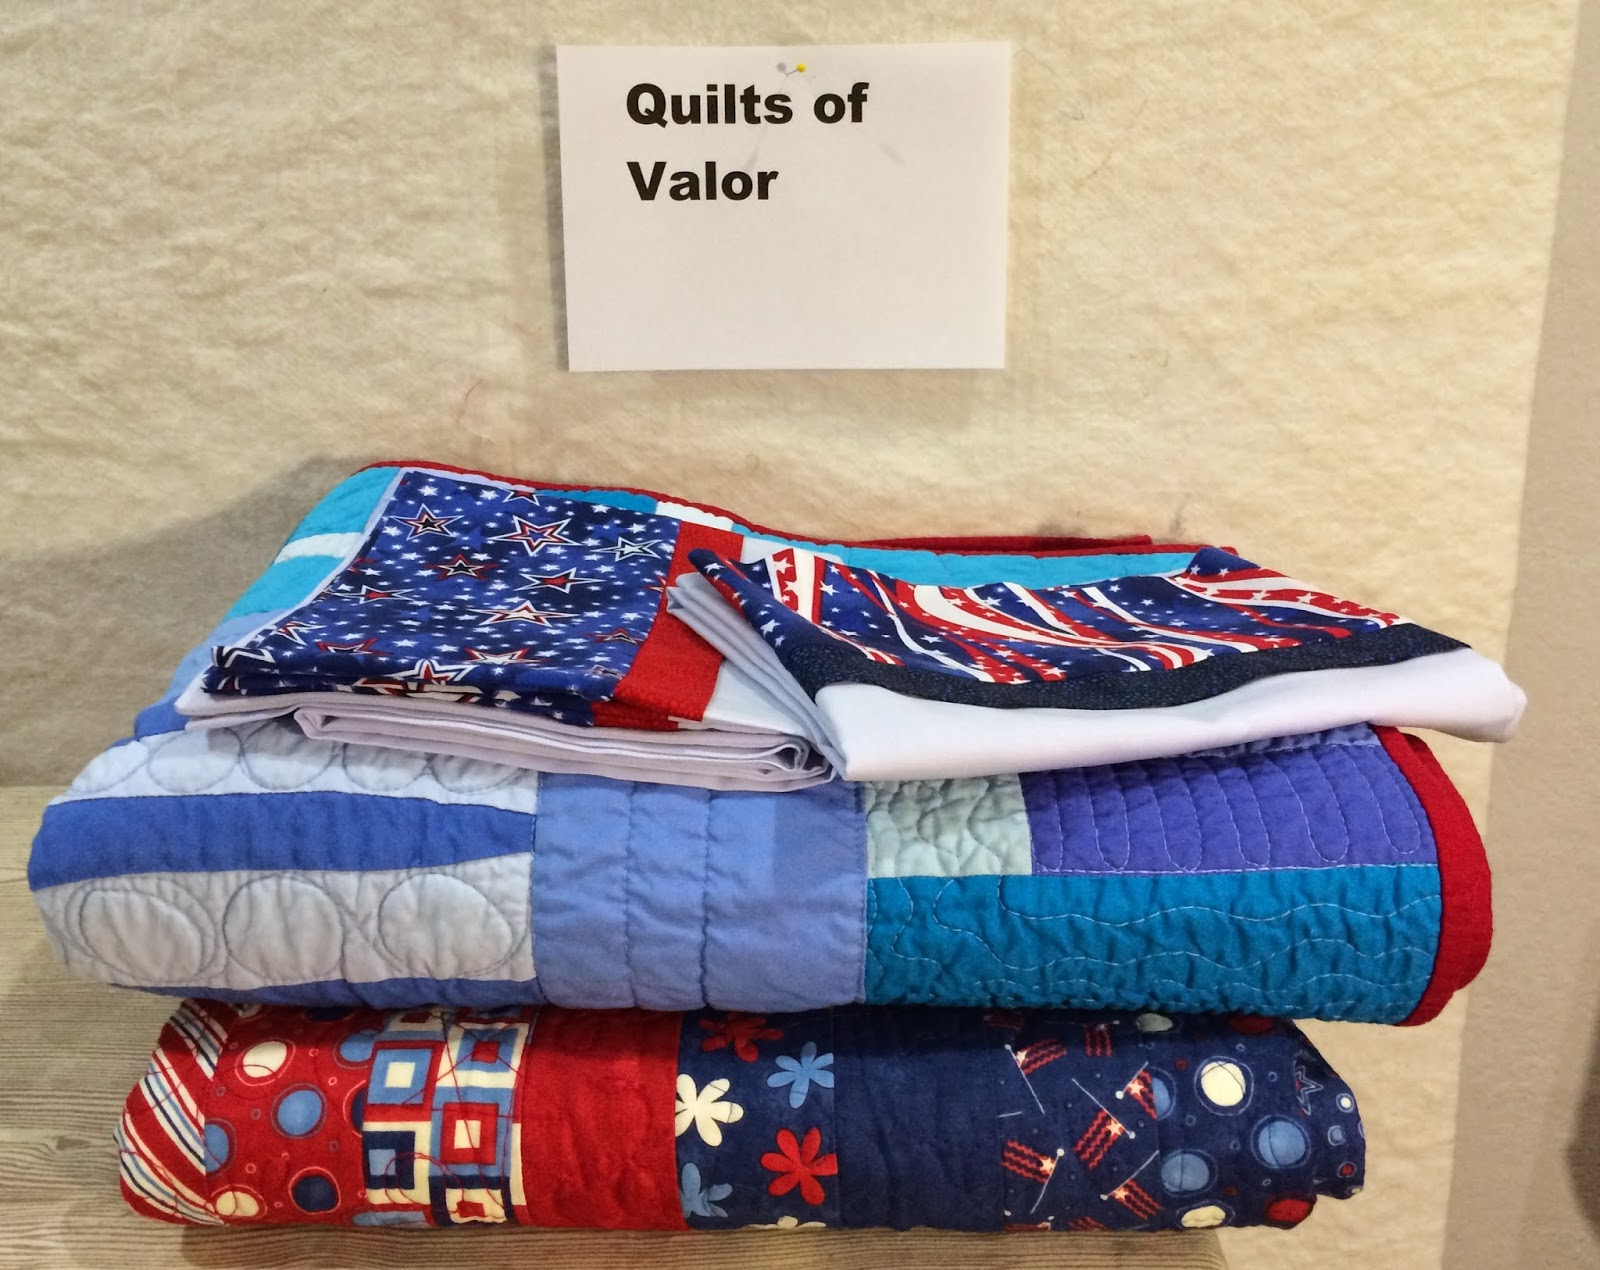 San Diego Modern Quilt Guild: We Make Stuff. And Give it Away ... : san diego modern quilt guild - Adamdwight.com